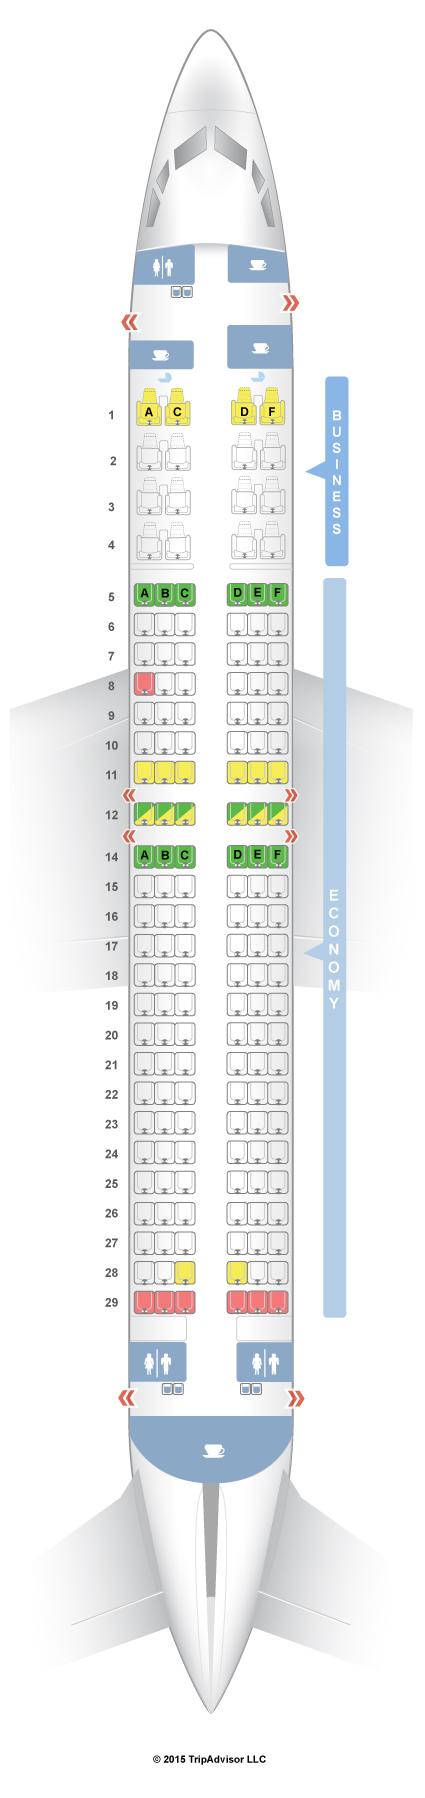 SeatGuru Seat Map Malaysia Airlines Boeing 737-800 (738) V2